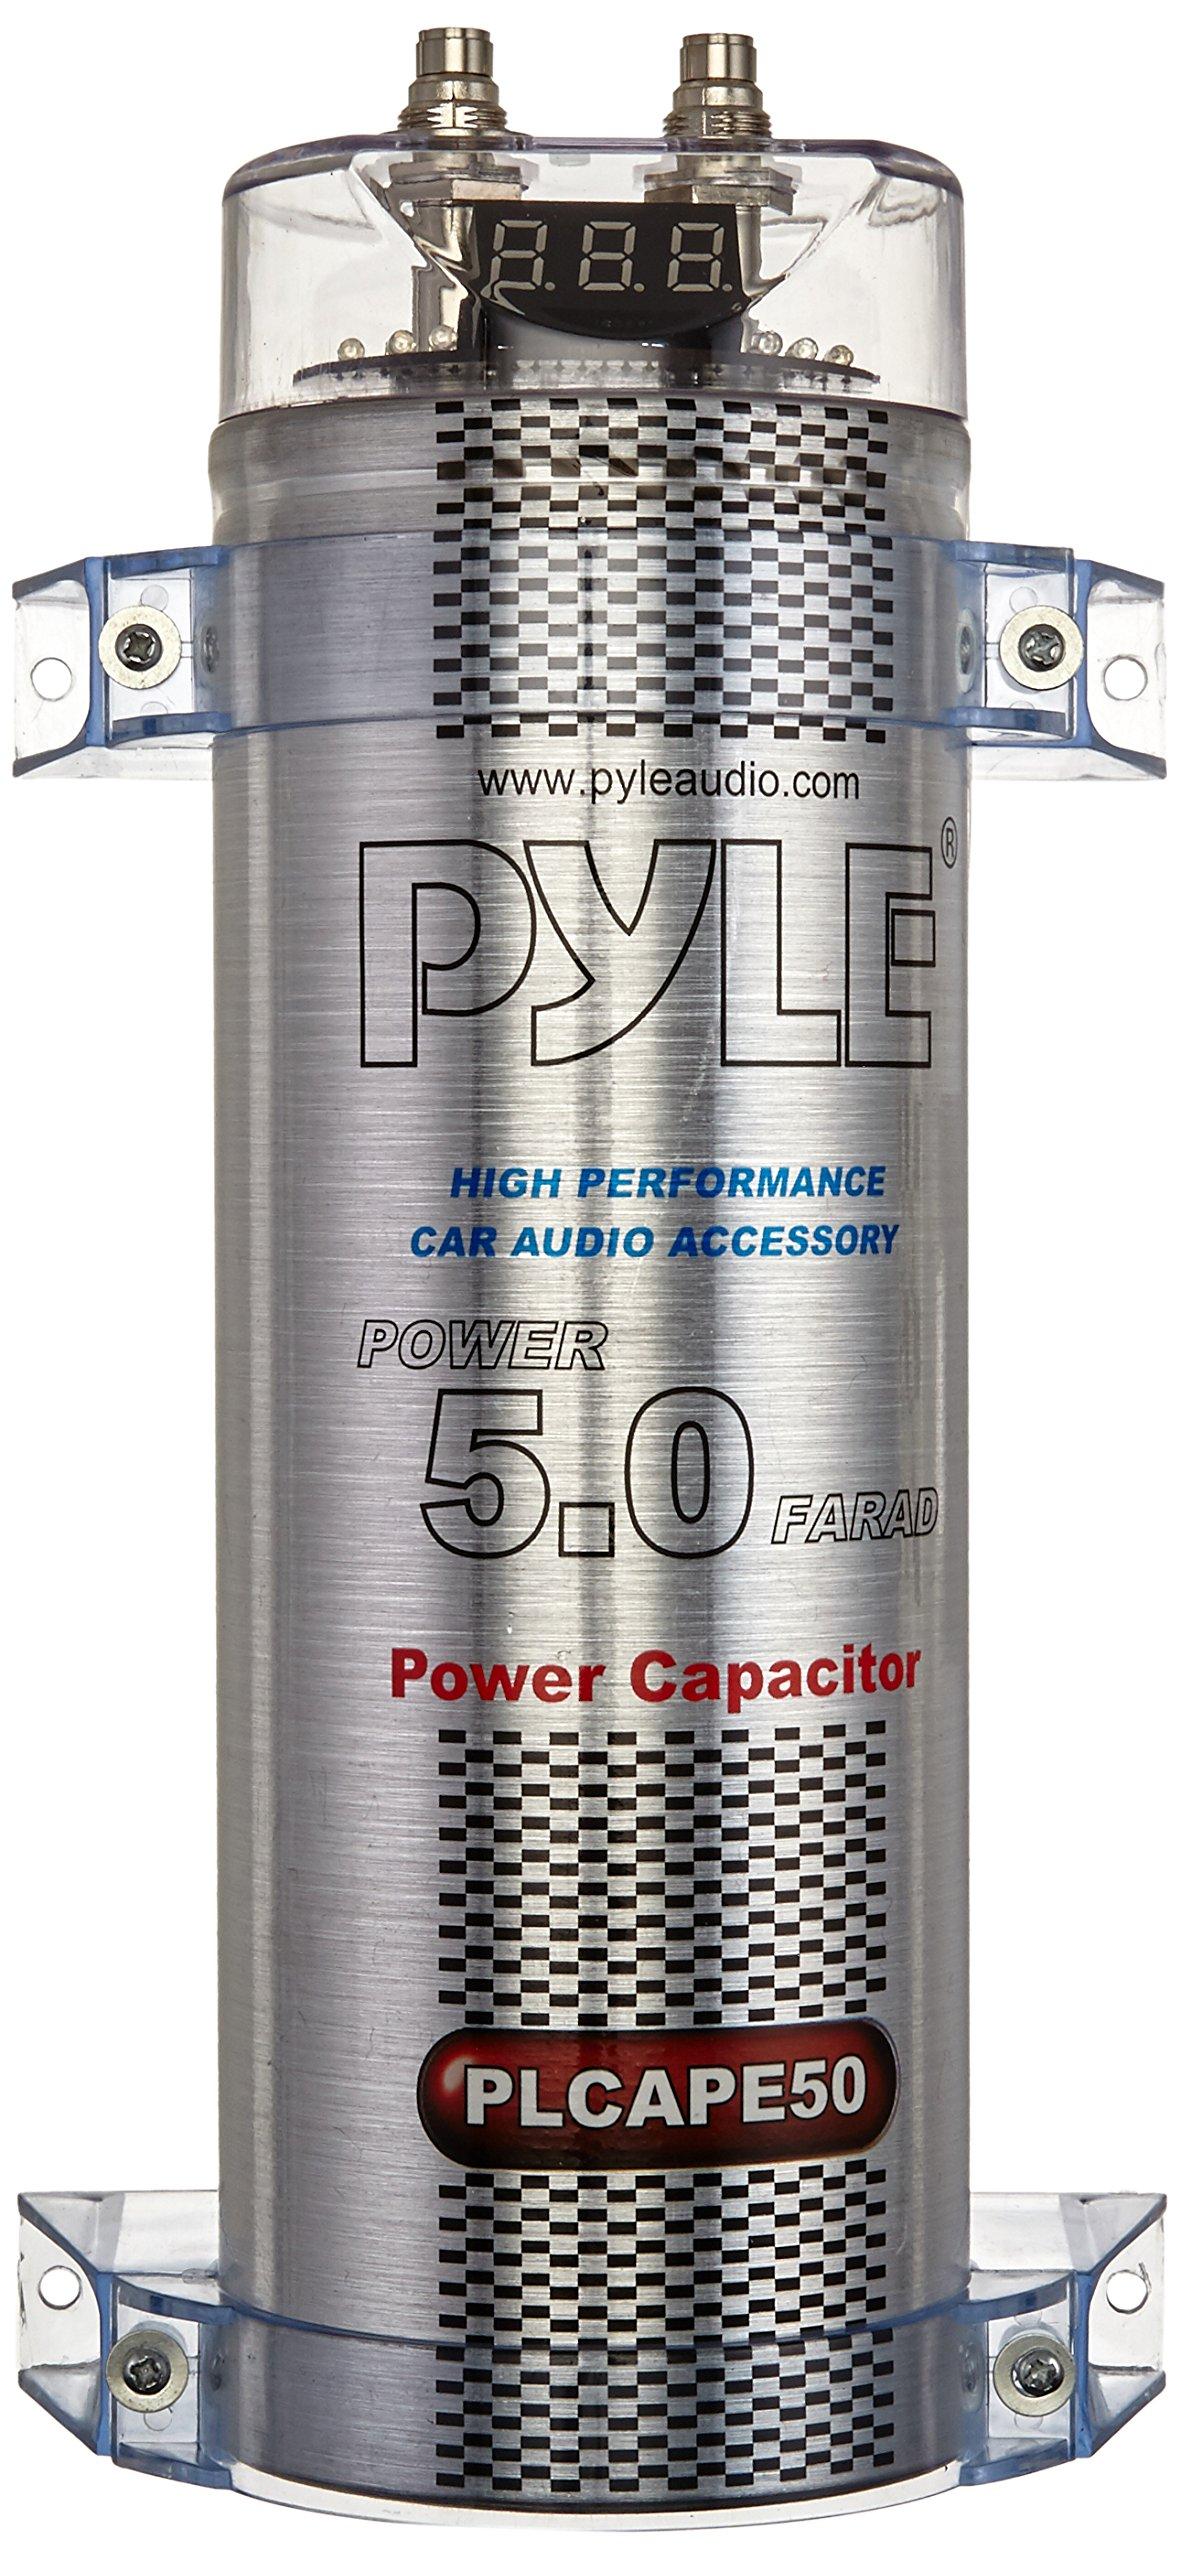 PYLE PLCAPE50 5.0 Farad Digital Power Capacitor by Pyle